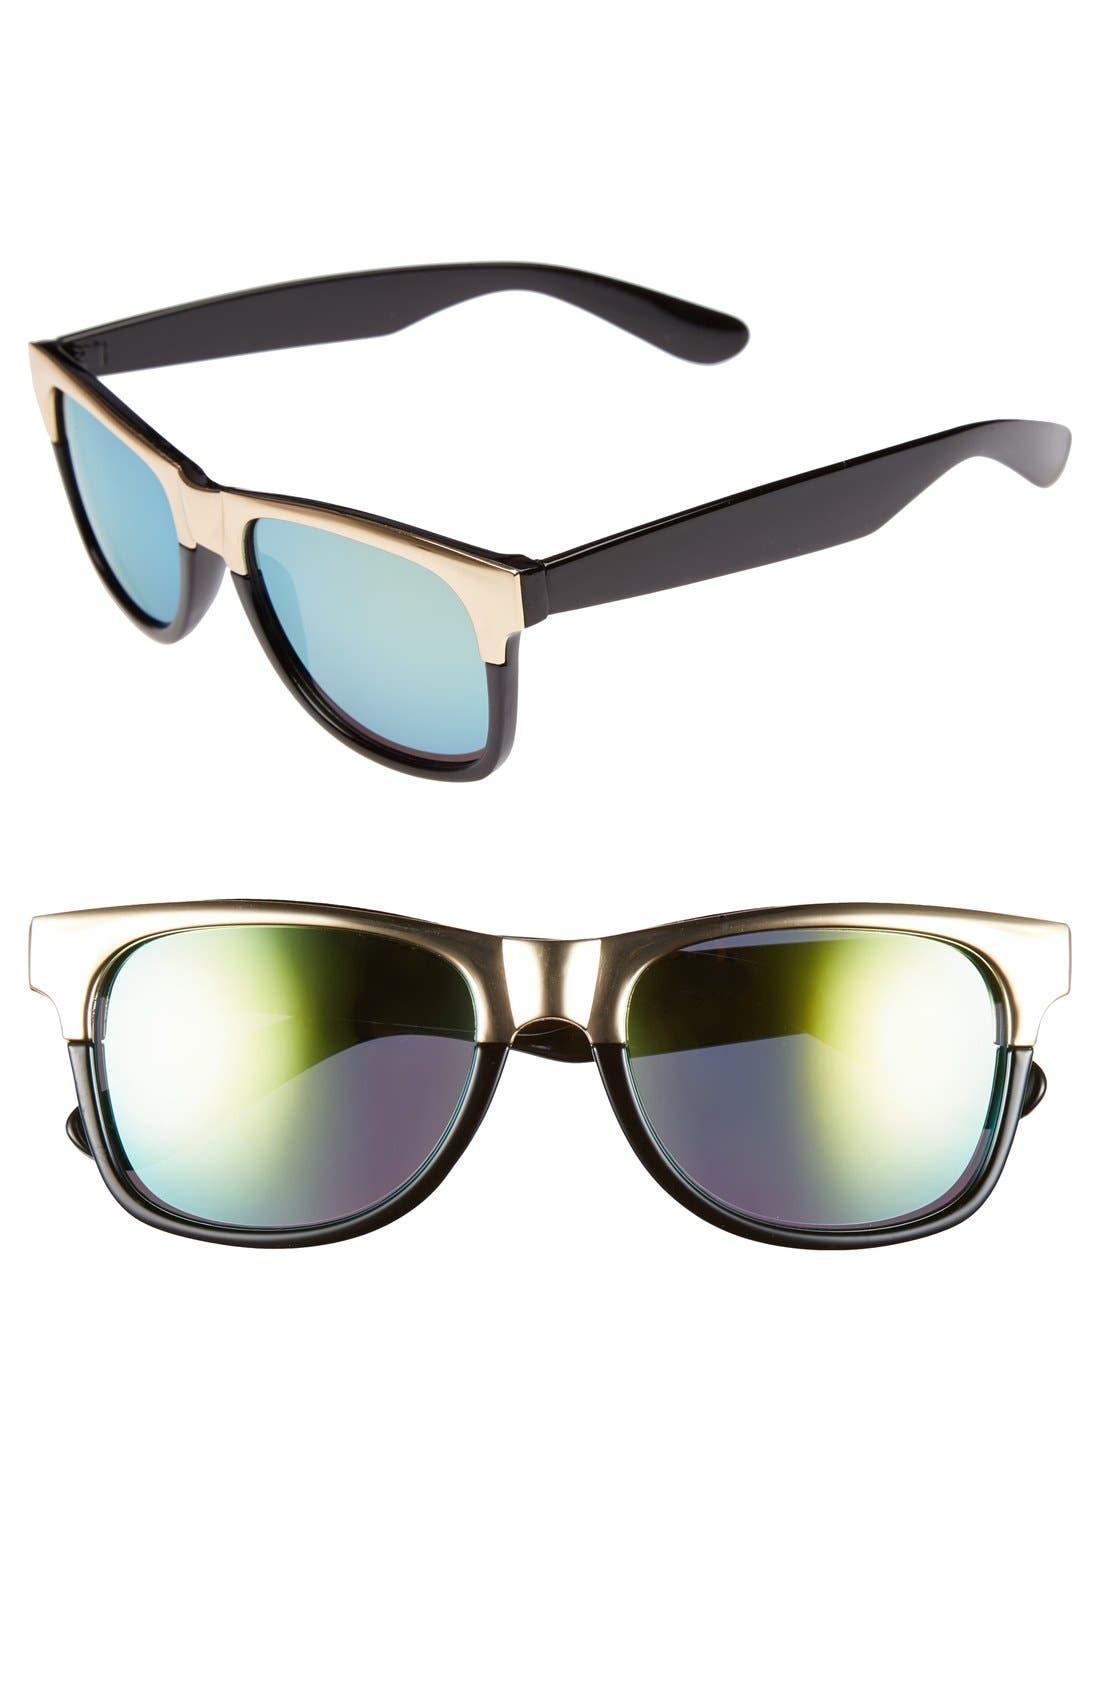 Alternate Image 1 Selected - FE NY 54mm Metallic Browline Sunglasses